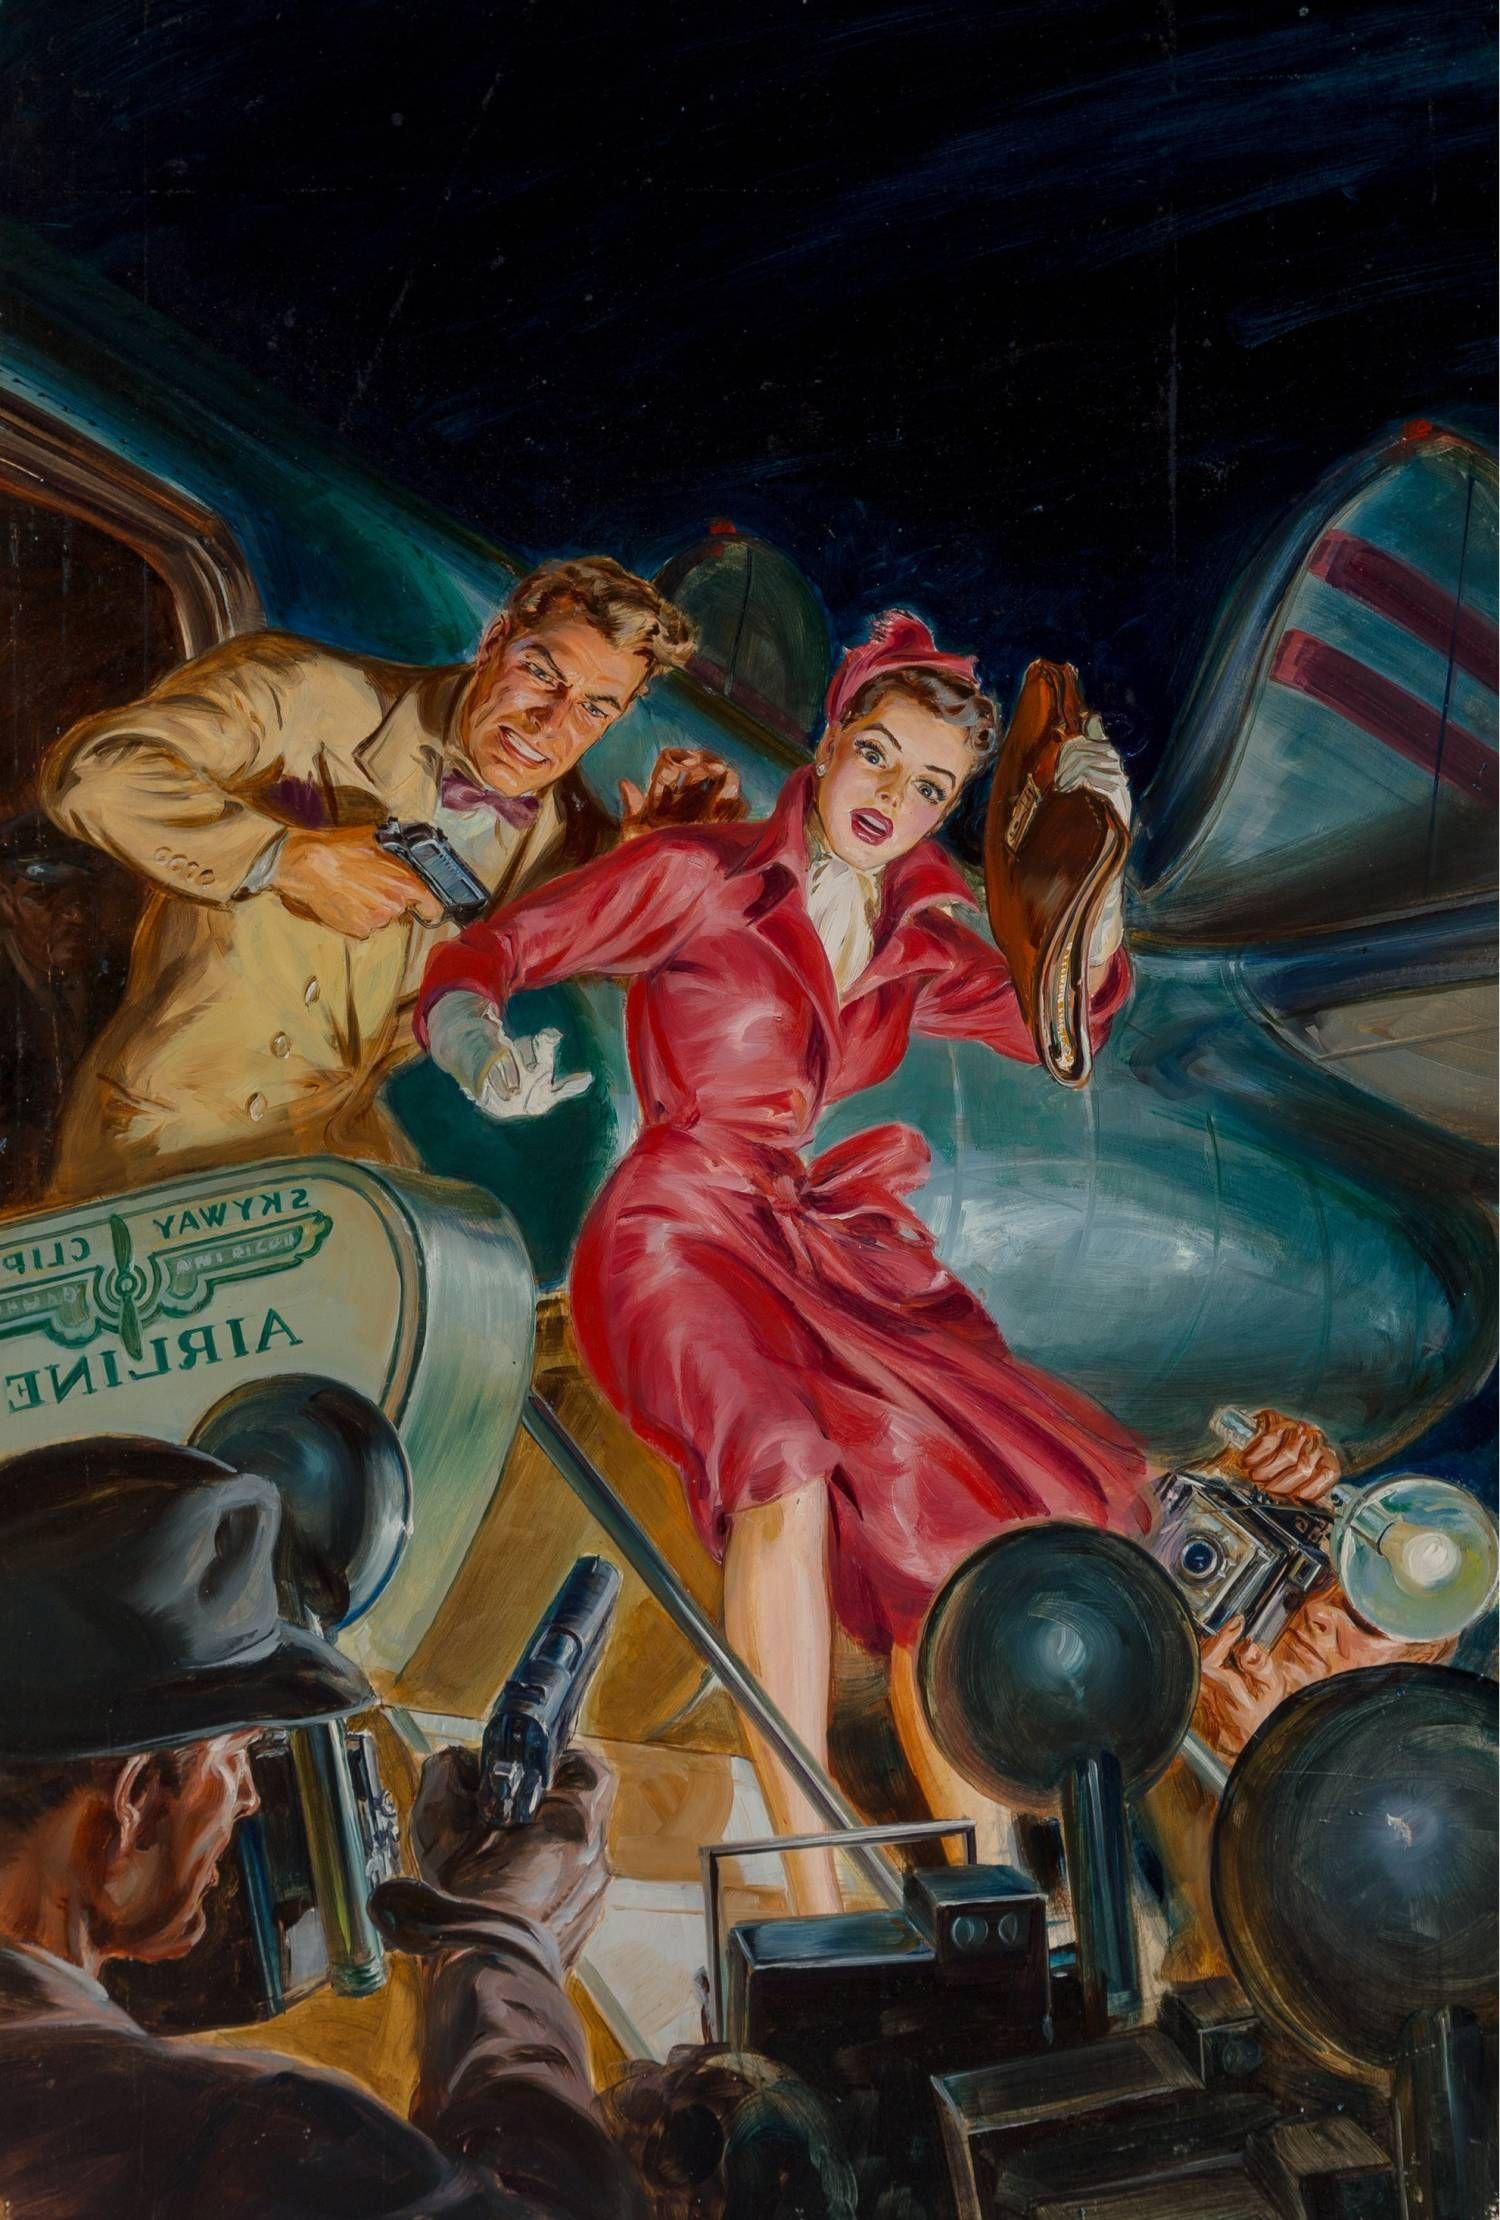 Dime Detective Magazine June 1951 Cover art